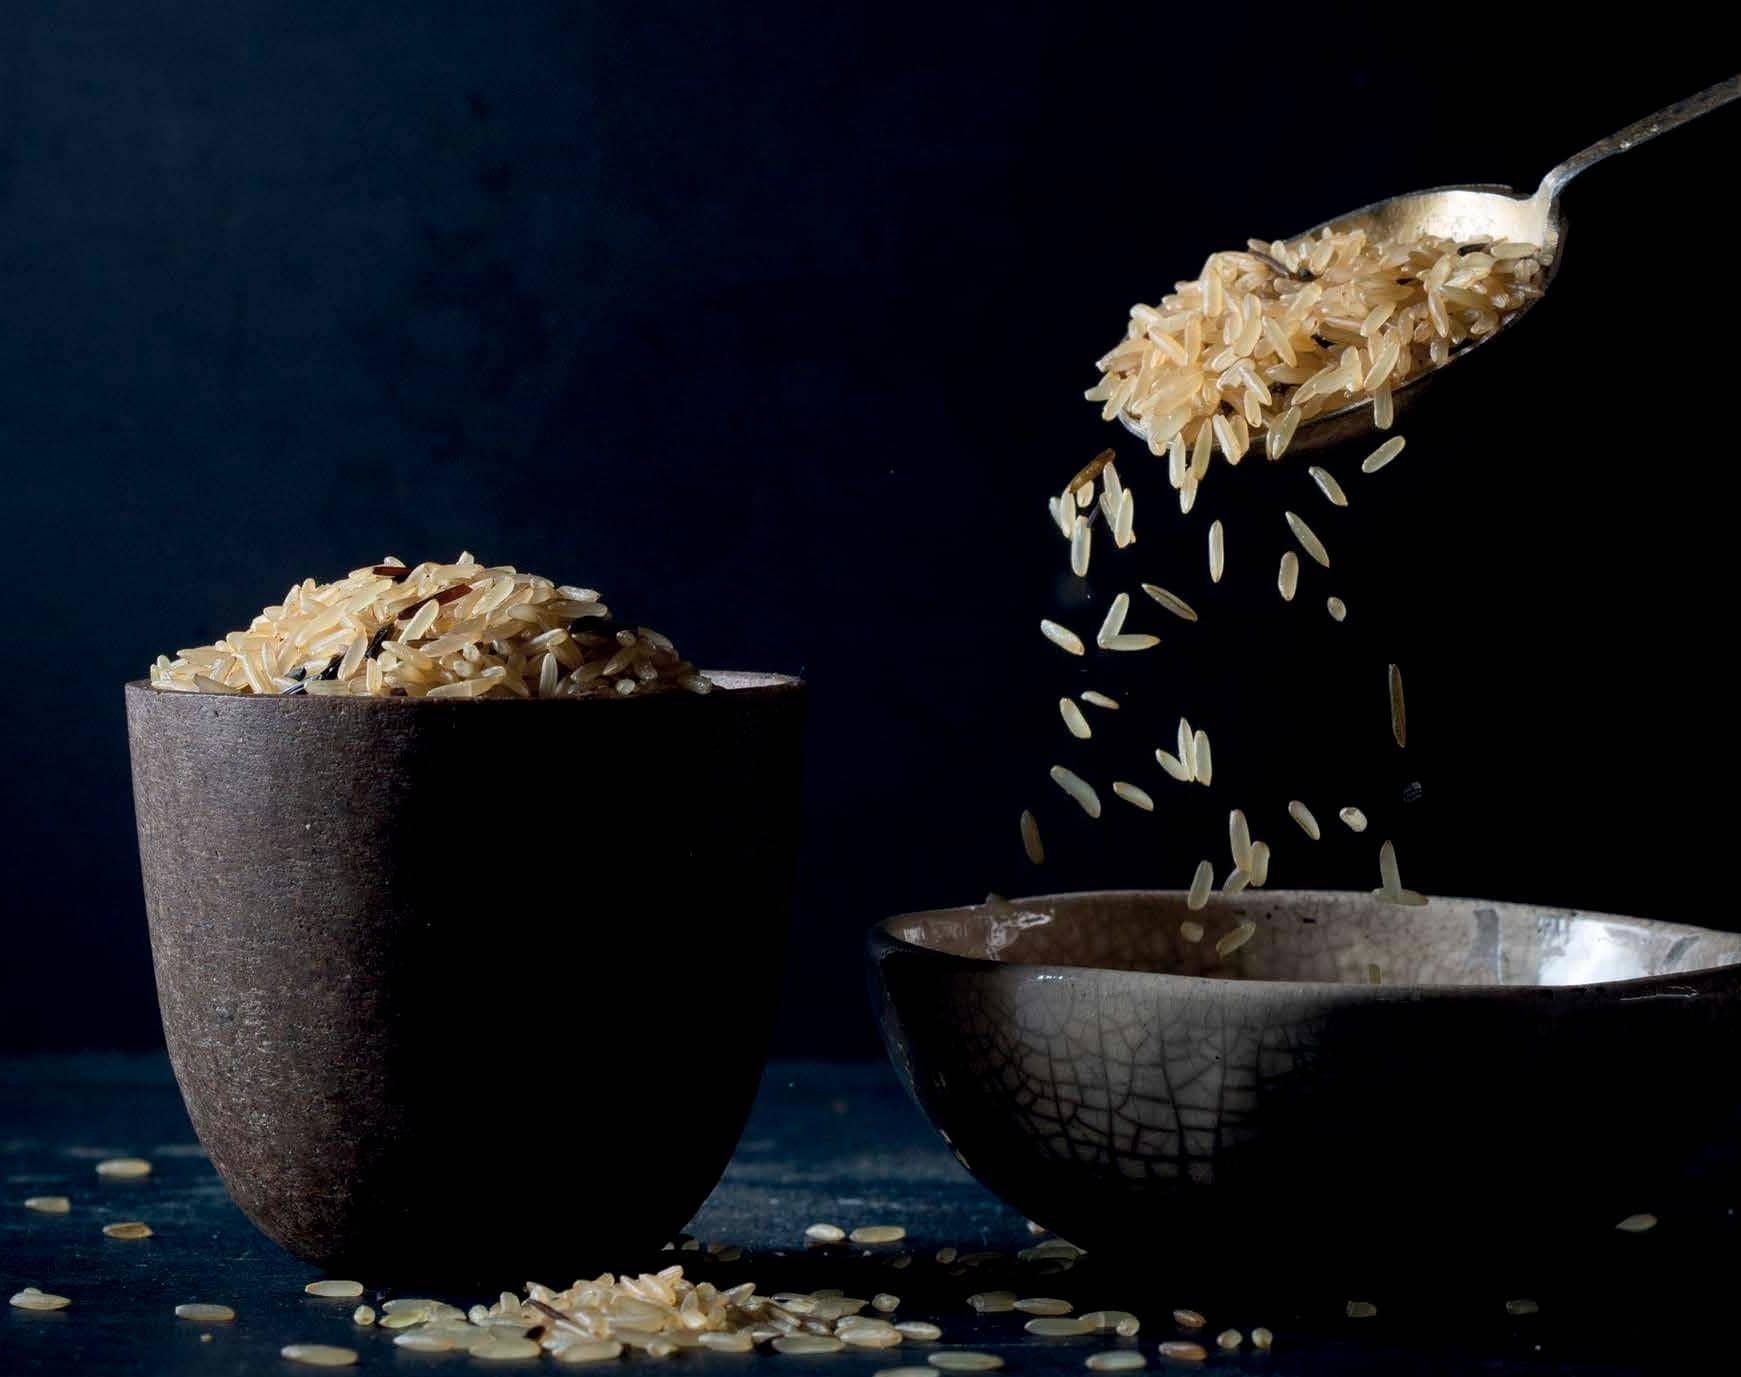 Secret Ingredient: Rice